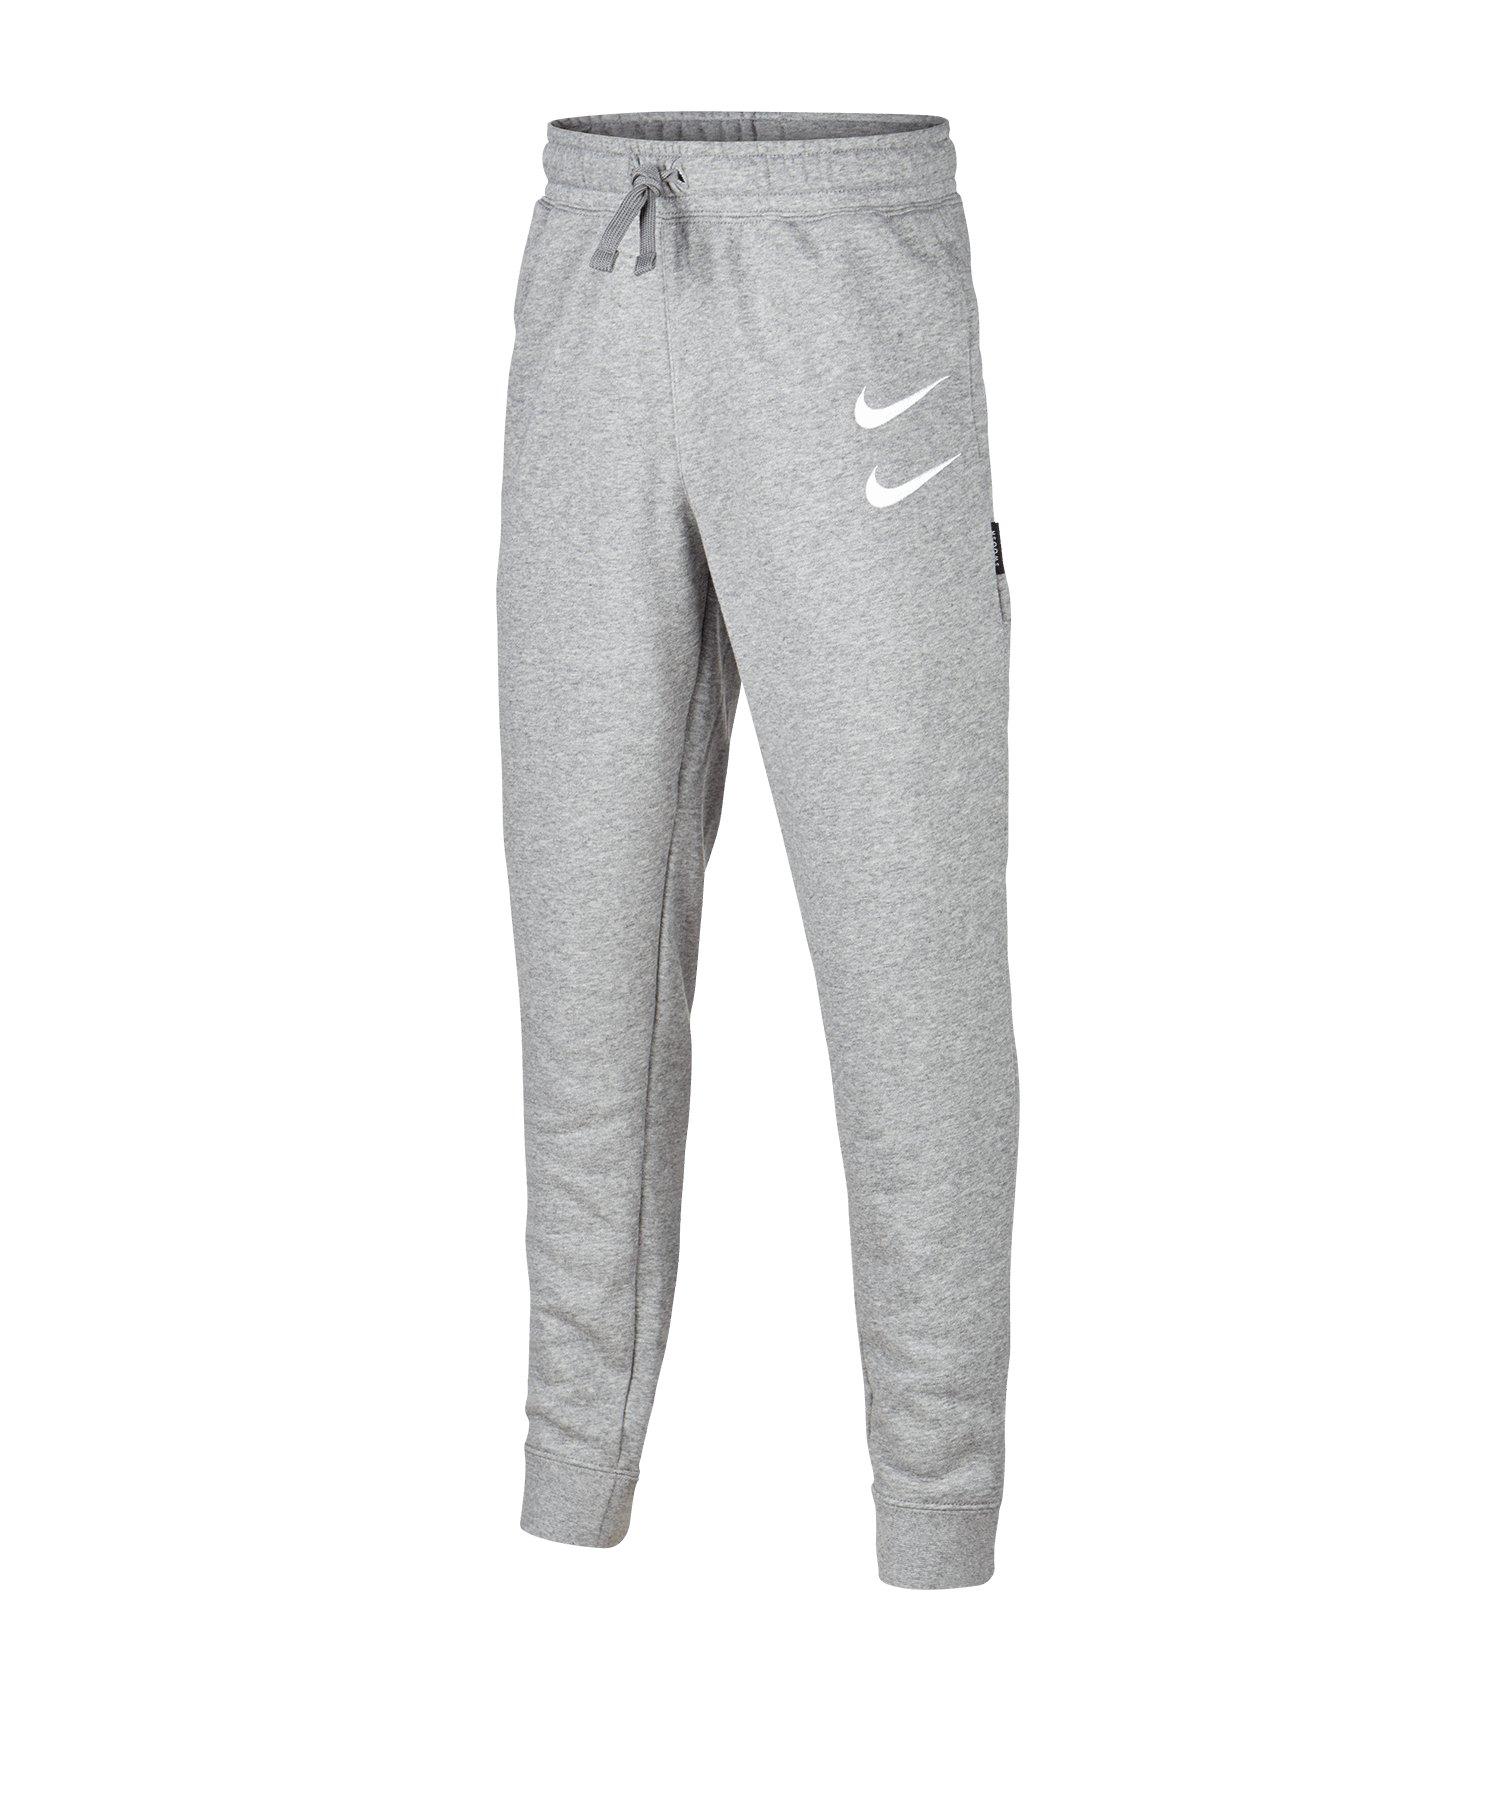 Nike Swoosh Pants Hose lang Kids Grau F091 - grau